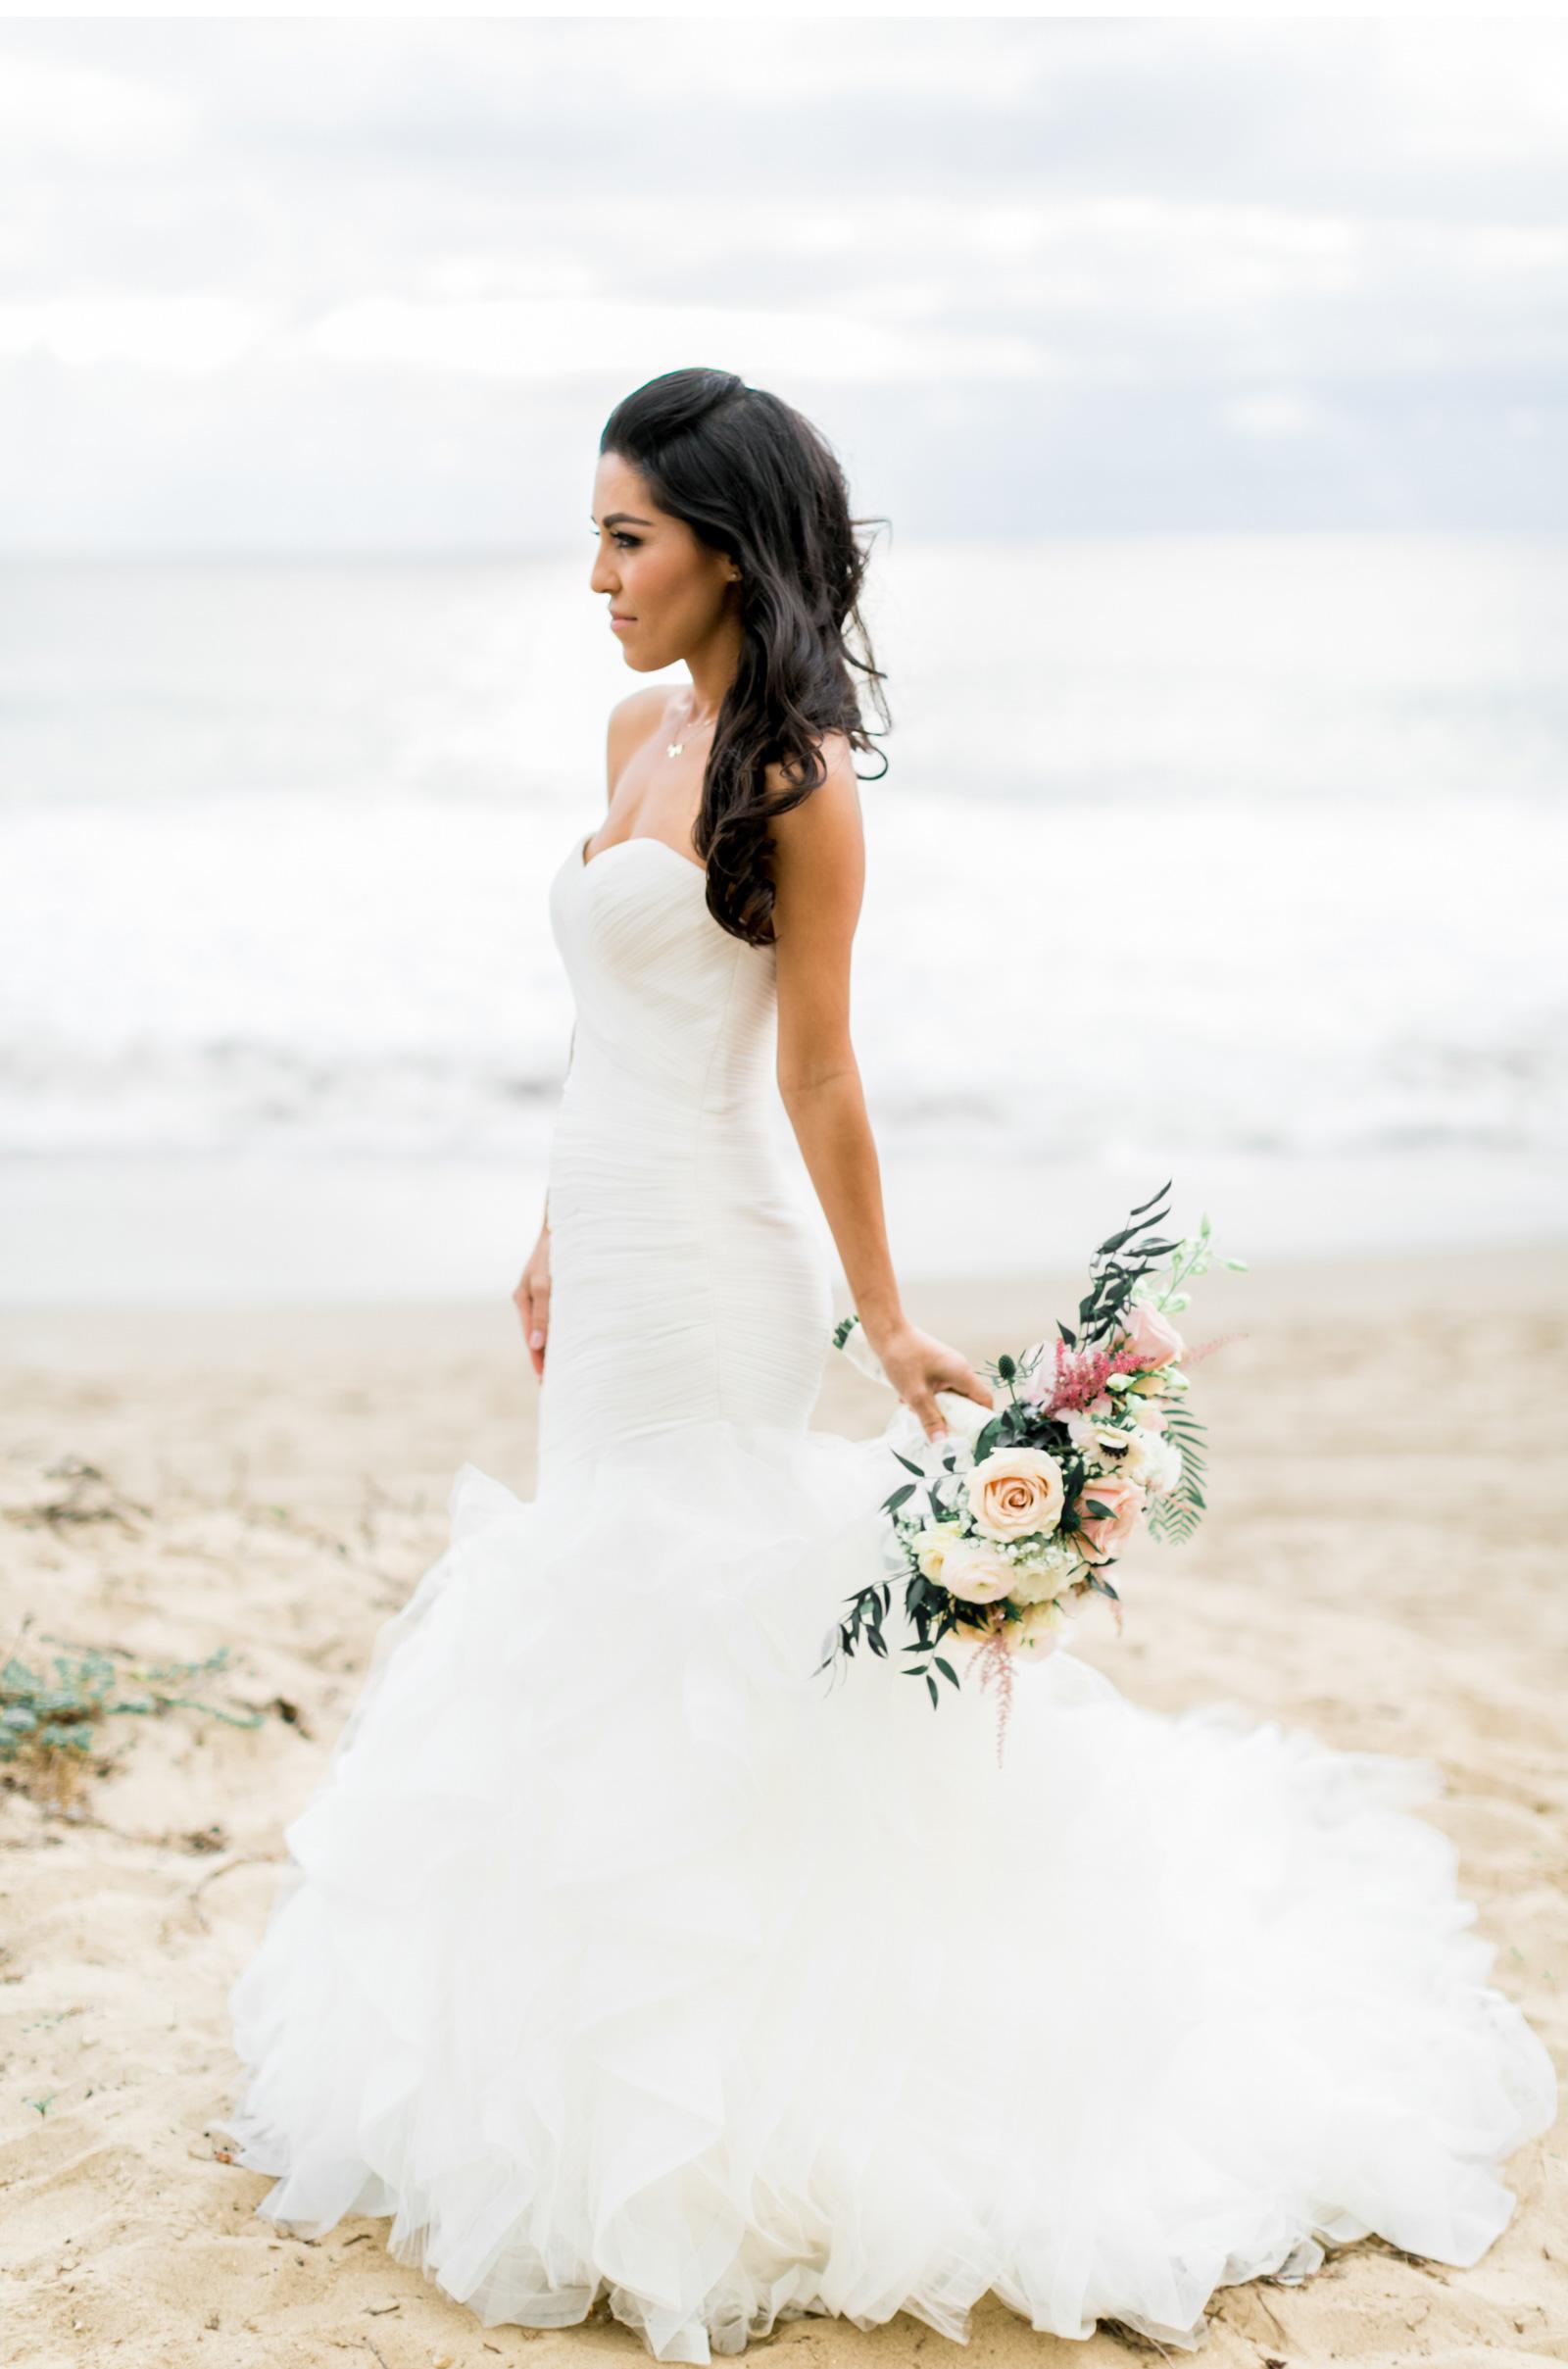 Malibu-First-Look-Natalie-Schutt-Photography-Rod-Brewster_16.jpg